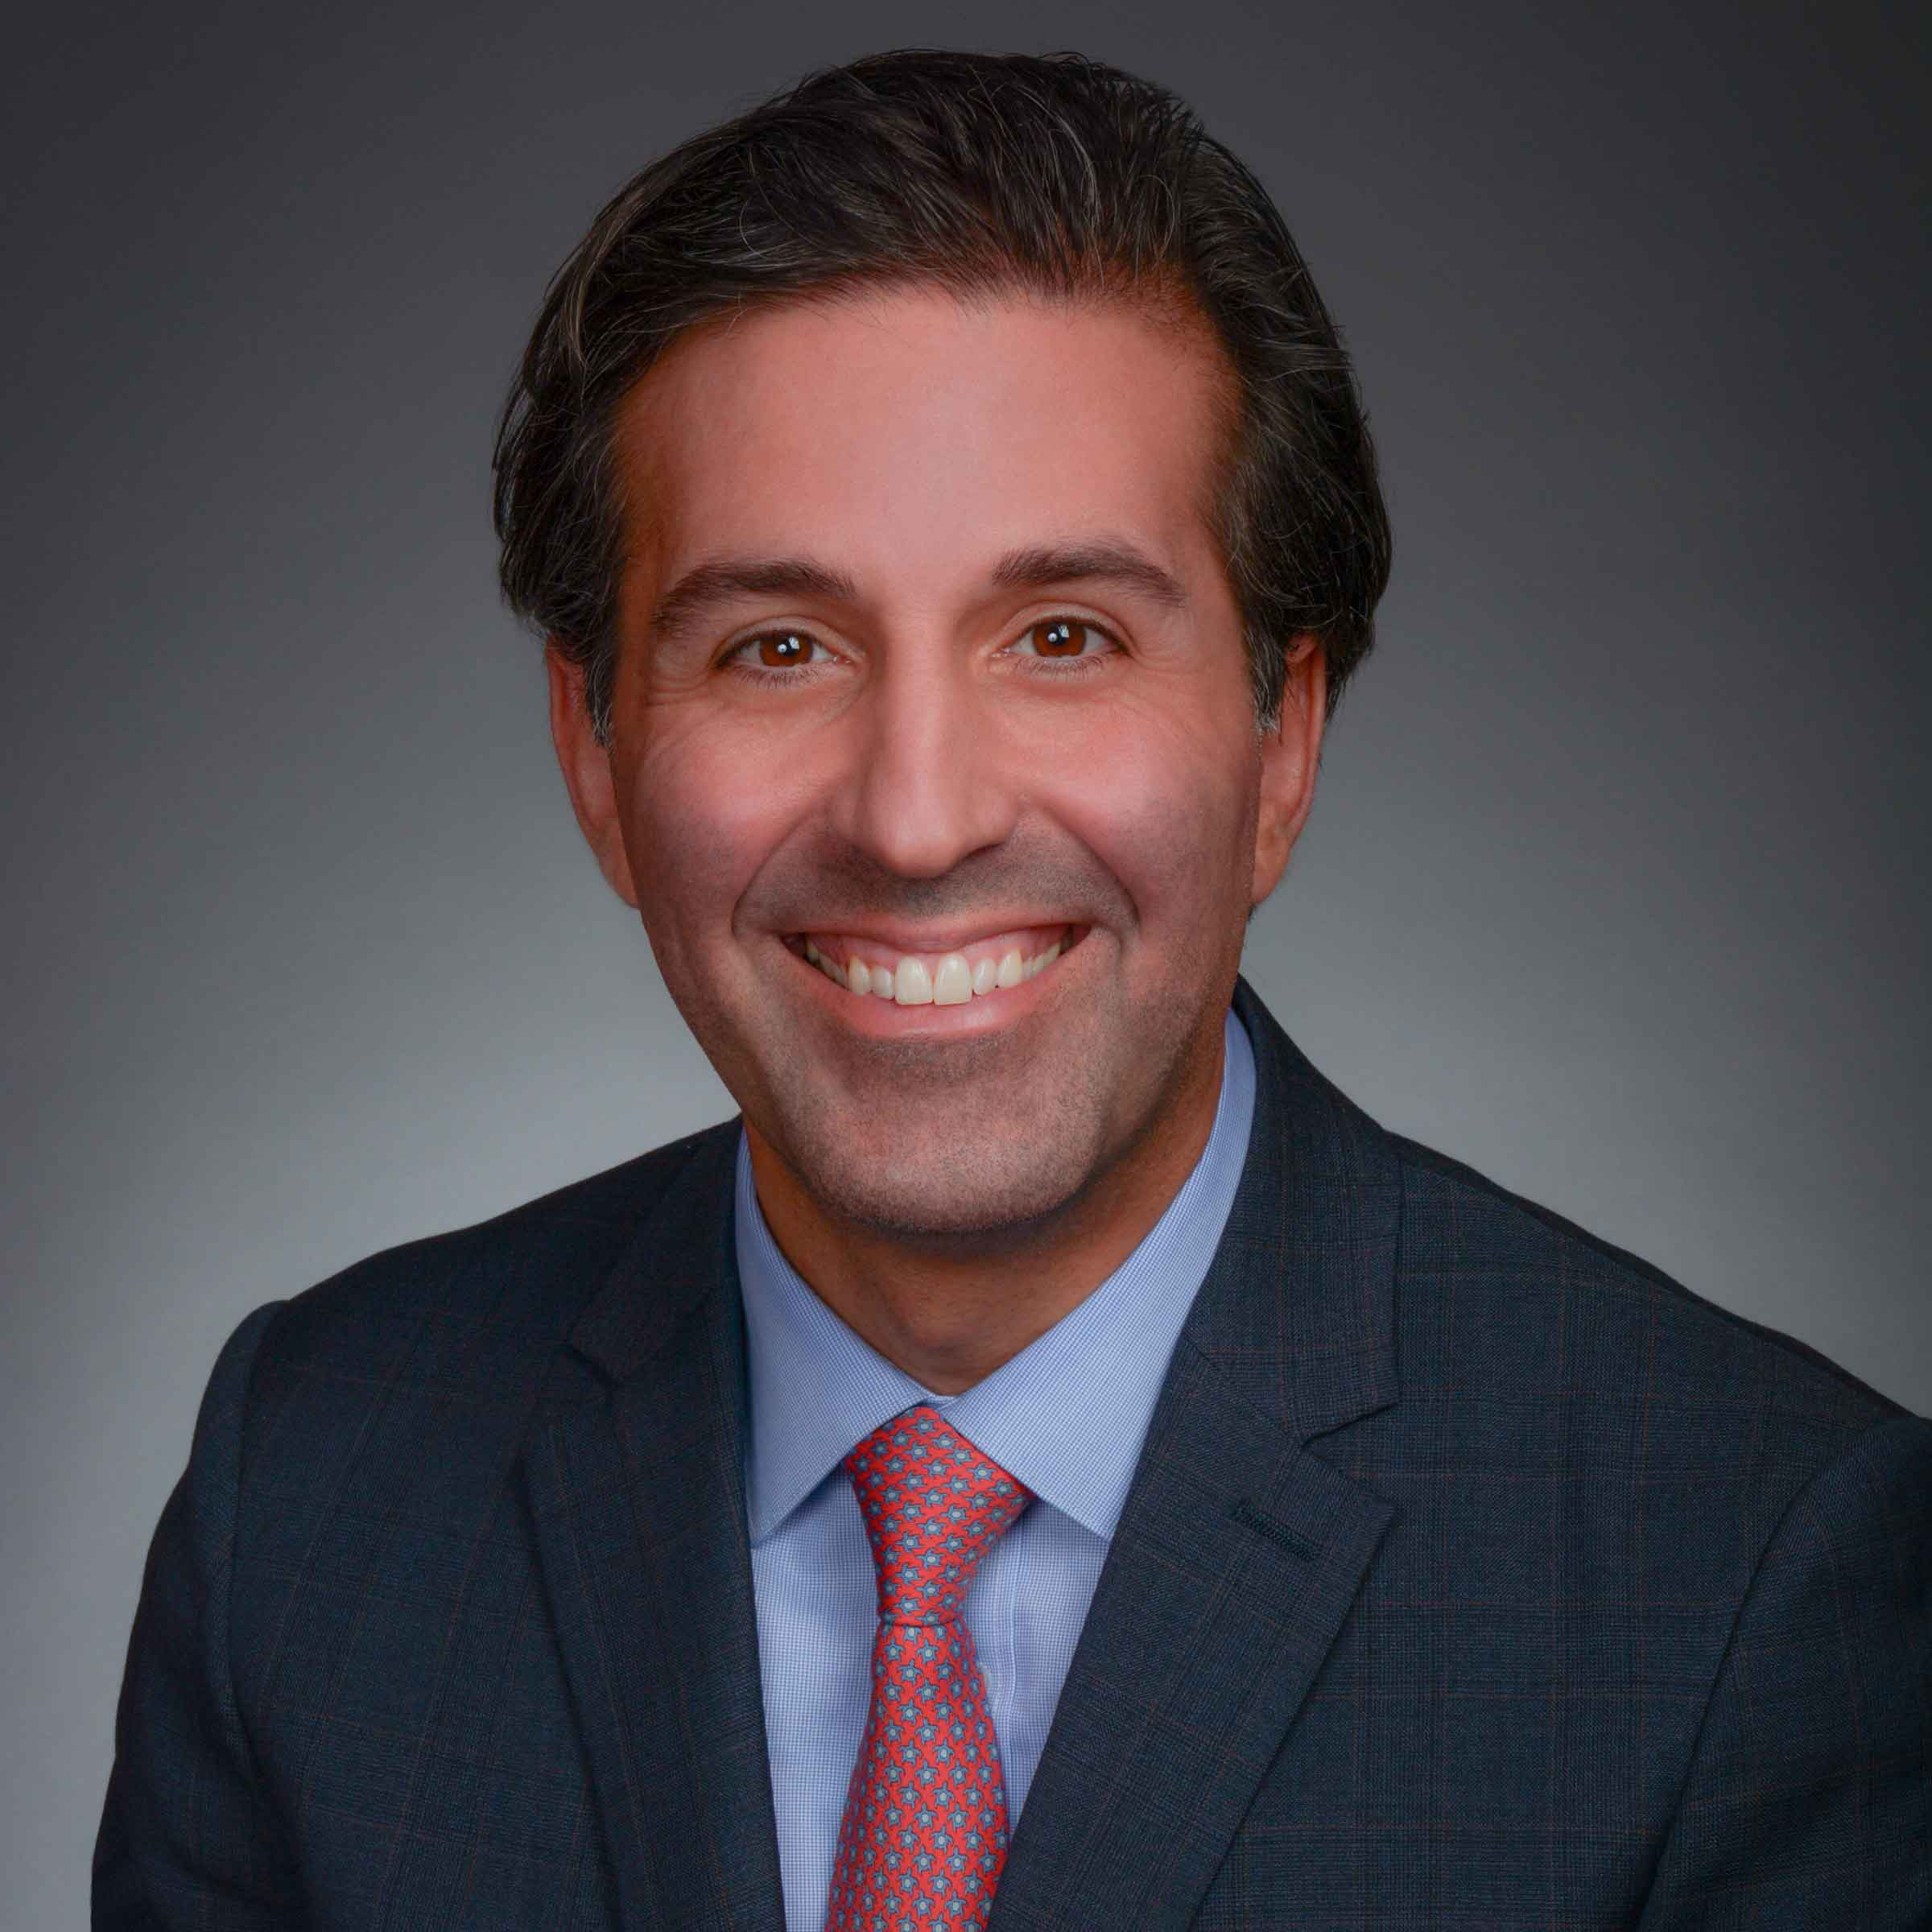 Kamiar Vossoughi, CFA, CFP portrait image. Your local Wealth Advisor in Hinsdale, IL.